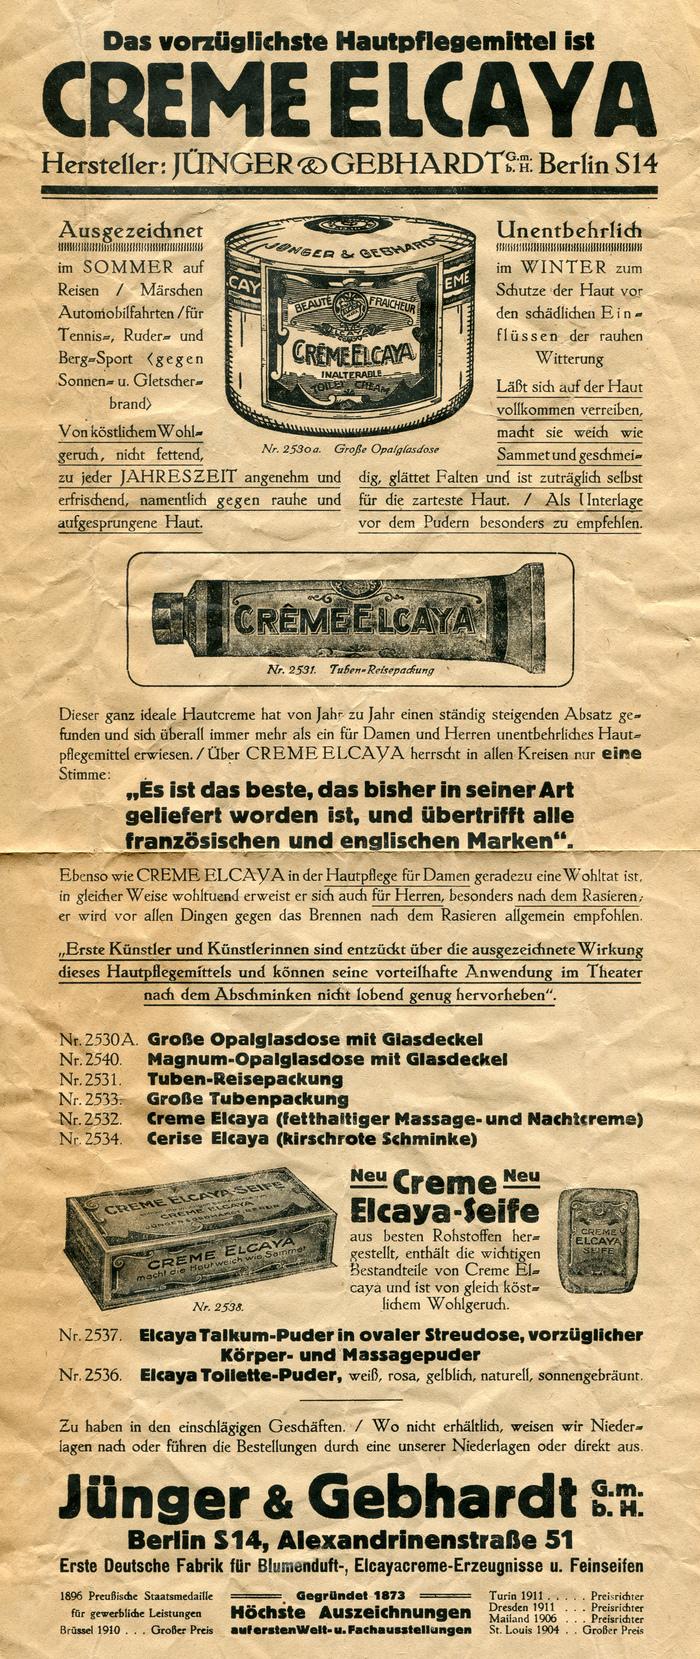 Creme Elcaya ad by Jünger & Gebhardt